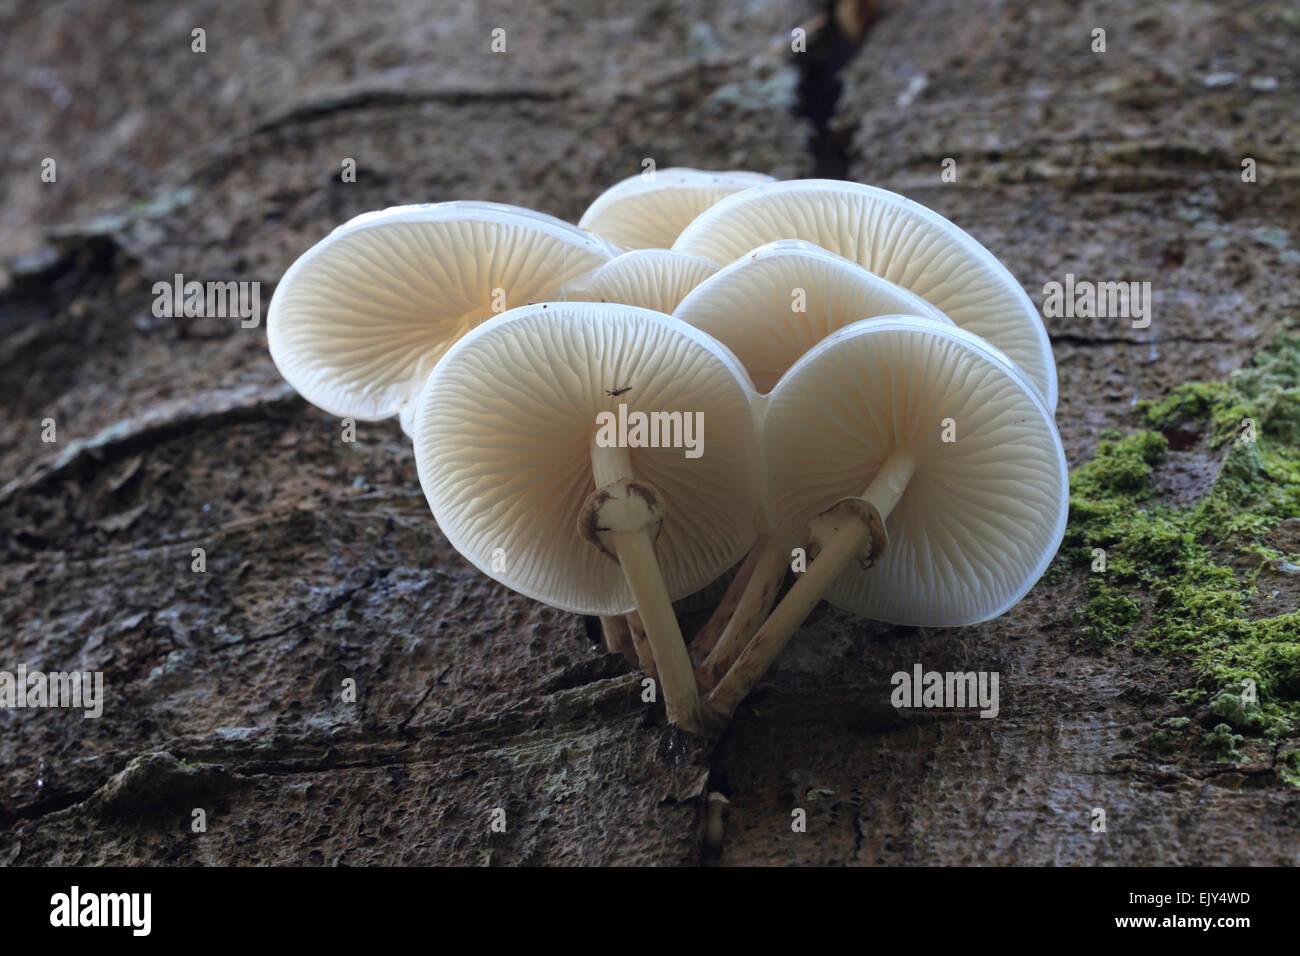 Porcelain Fungus captured in Porcelain Fungus, Lanthwaite Wood, Lake District - Stock Image